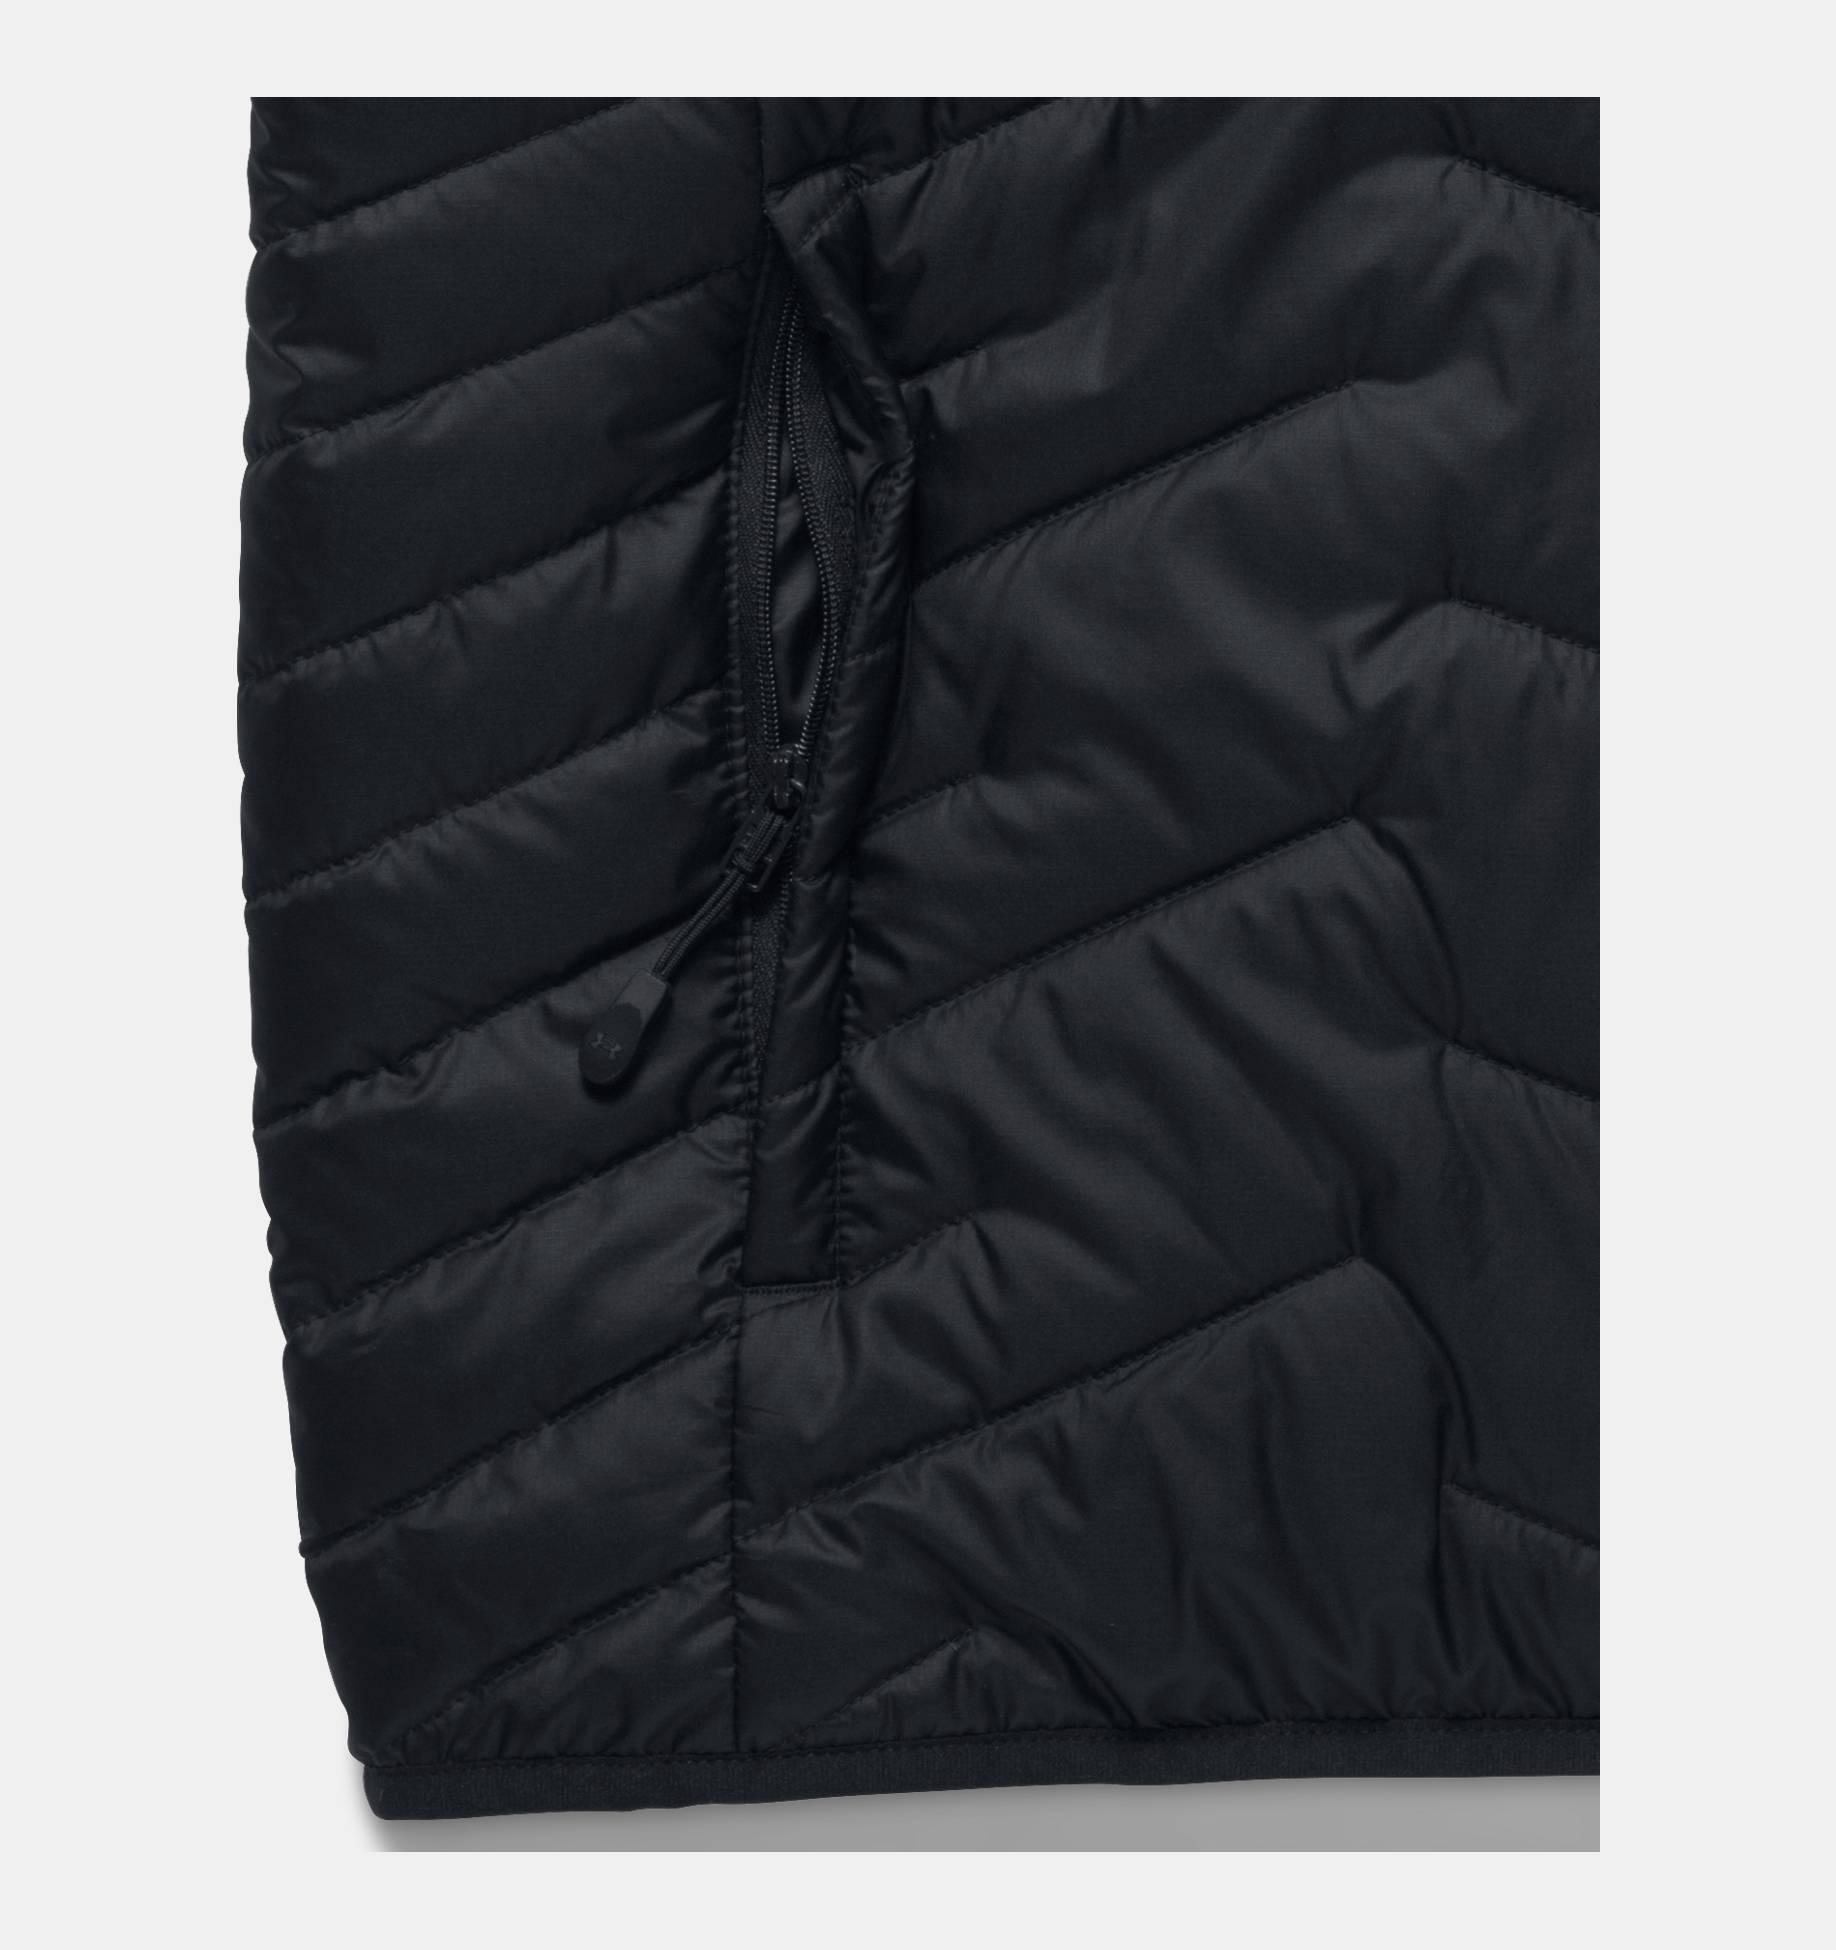 Under Armour ColdGear Reactor Hybrid Jacket Herren Outdoor Jacke 1316037-001